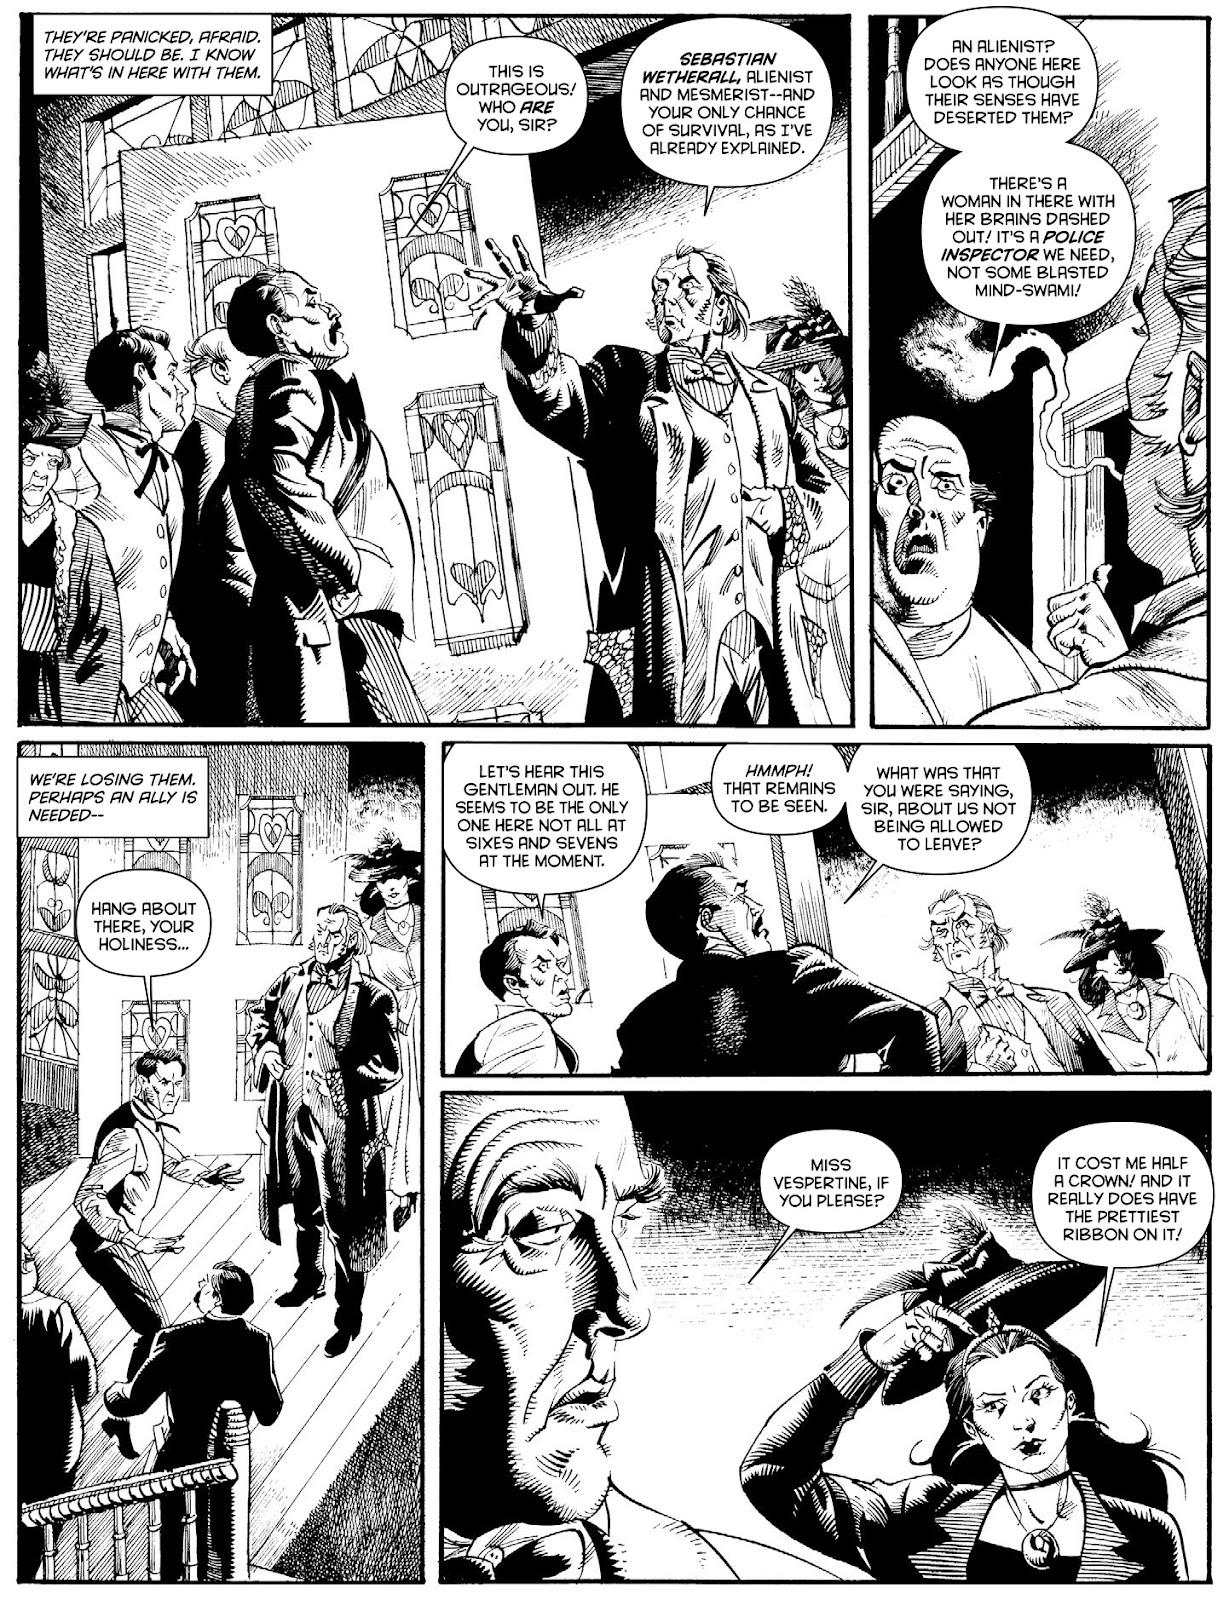 Judge Dredd Megazine (Vol. 5) issue 427 - Page 84